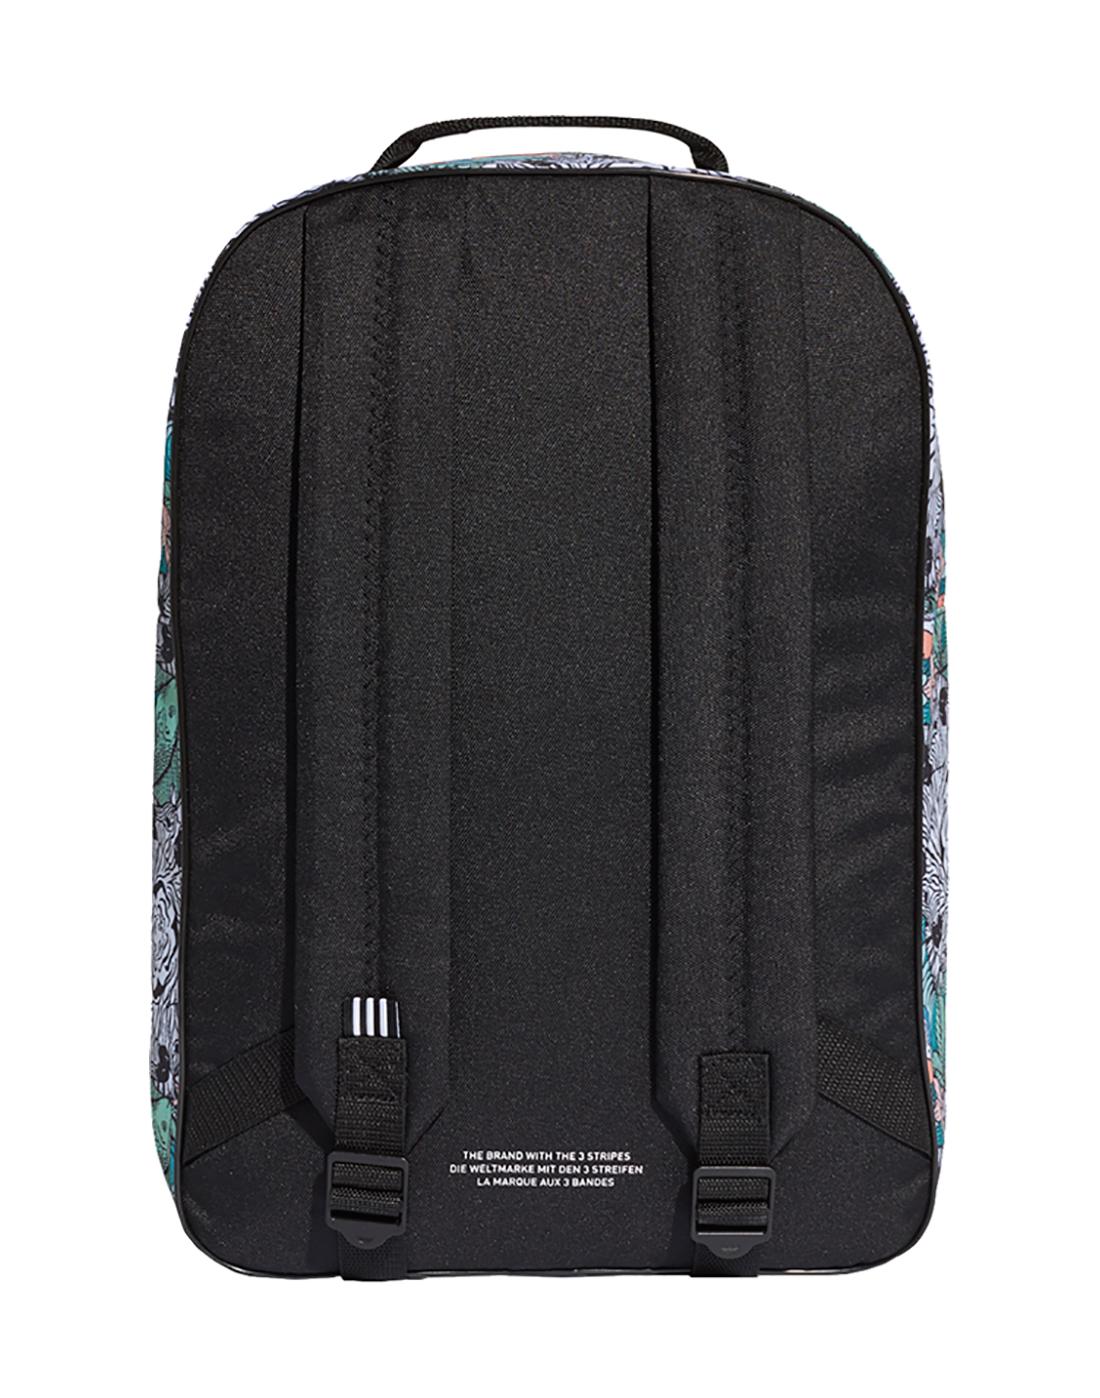 d904448d72d adidas Originals Animal Print Backpack | Life Style Sports